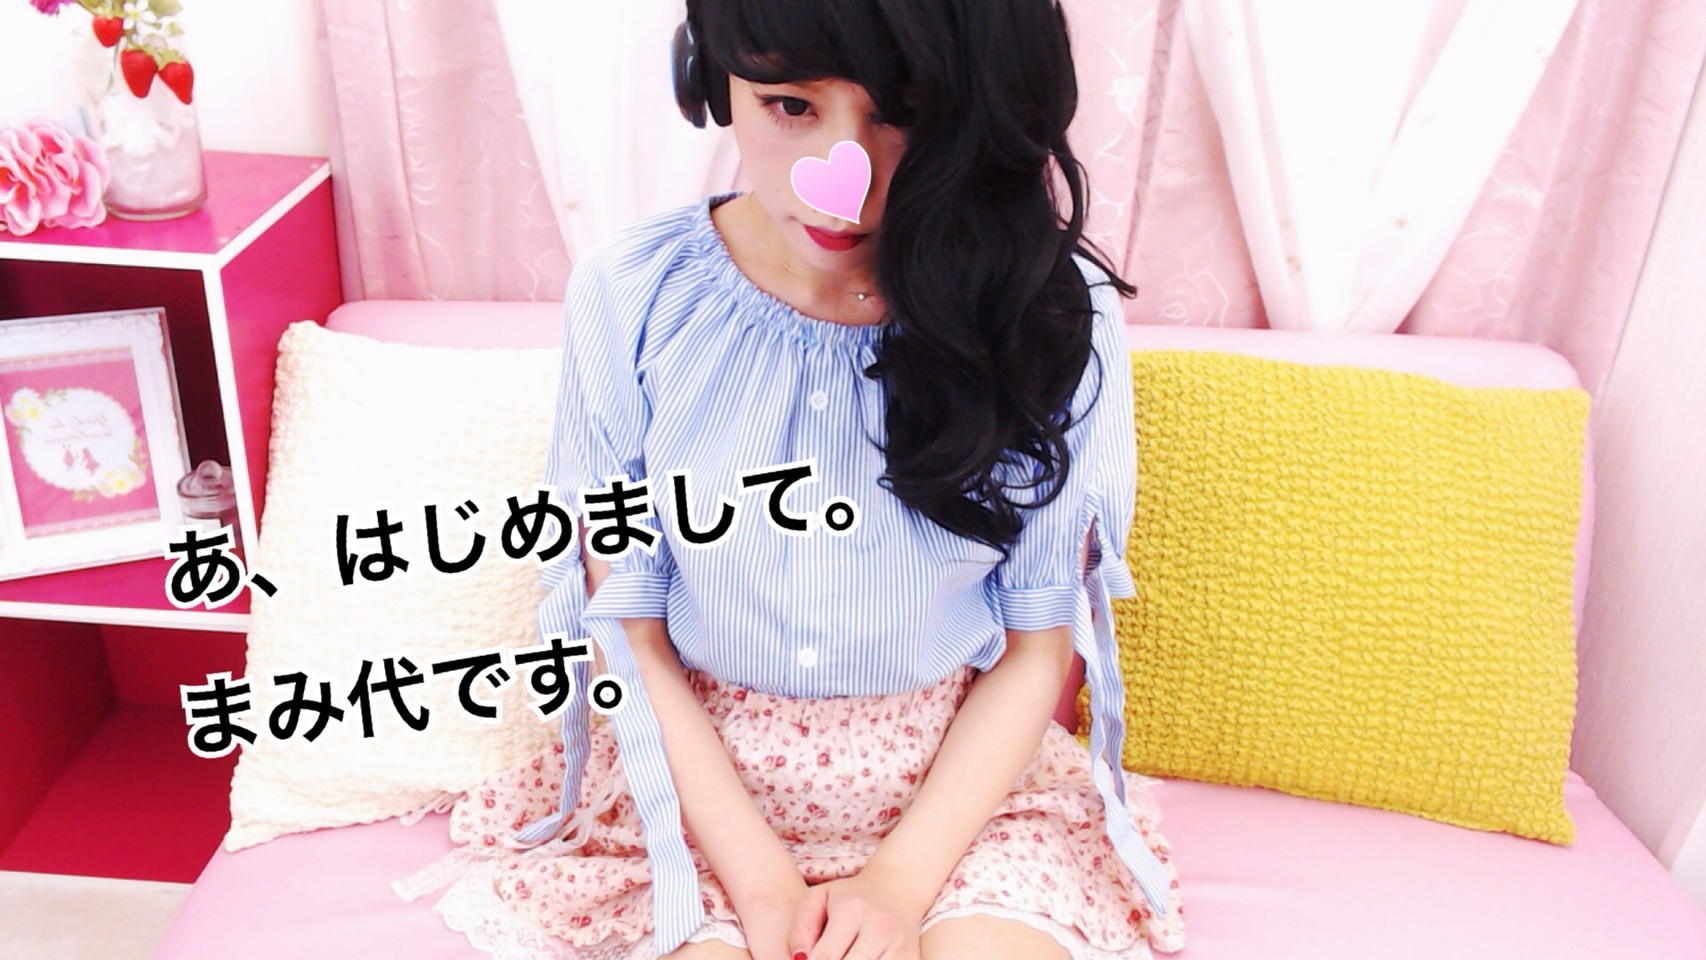 S__15736838.jpg